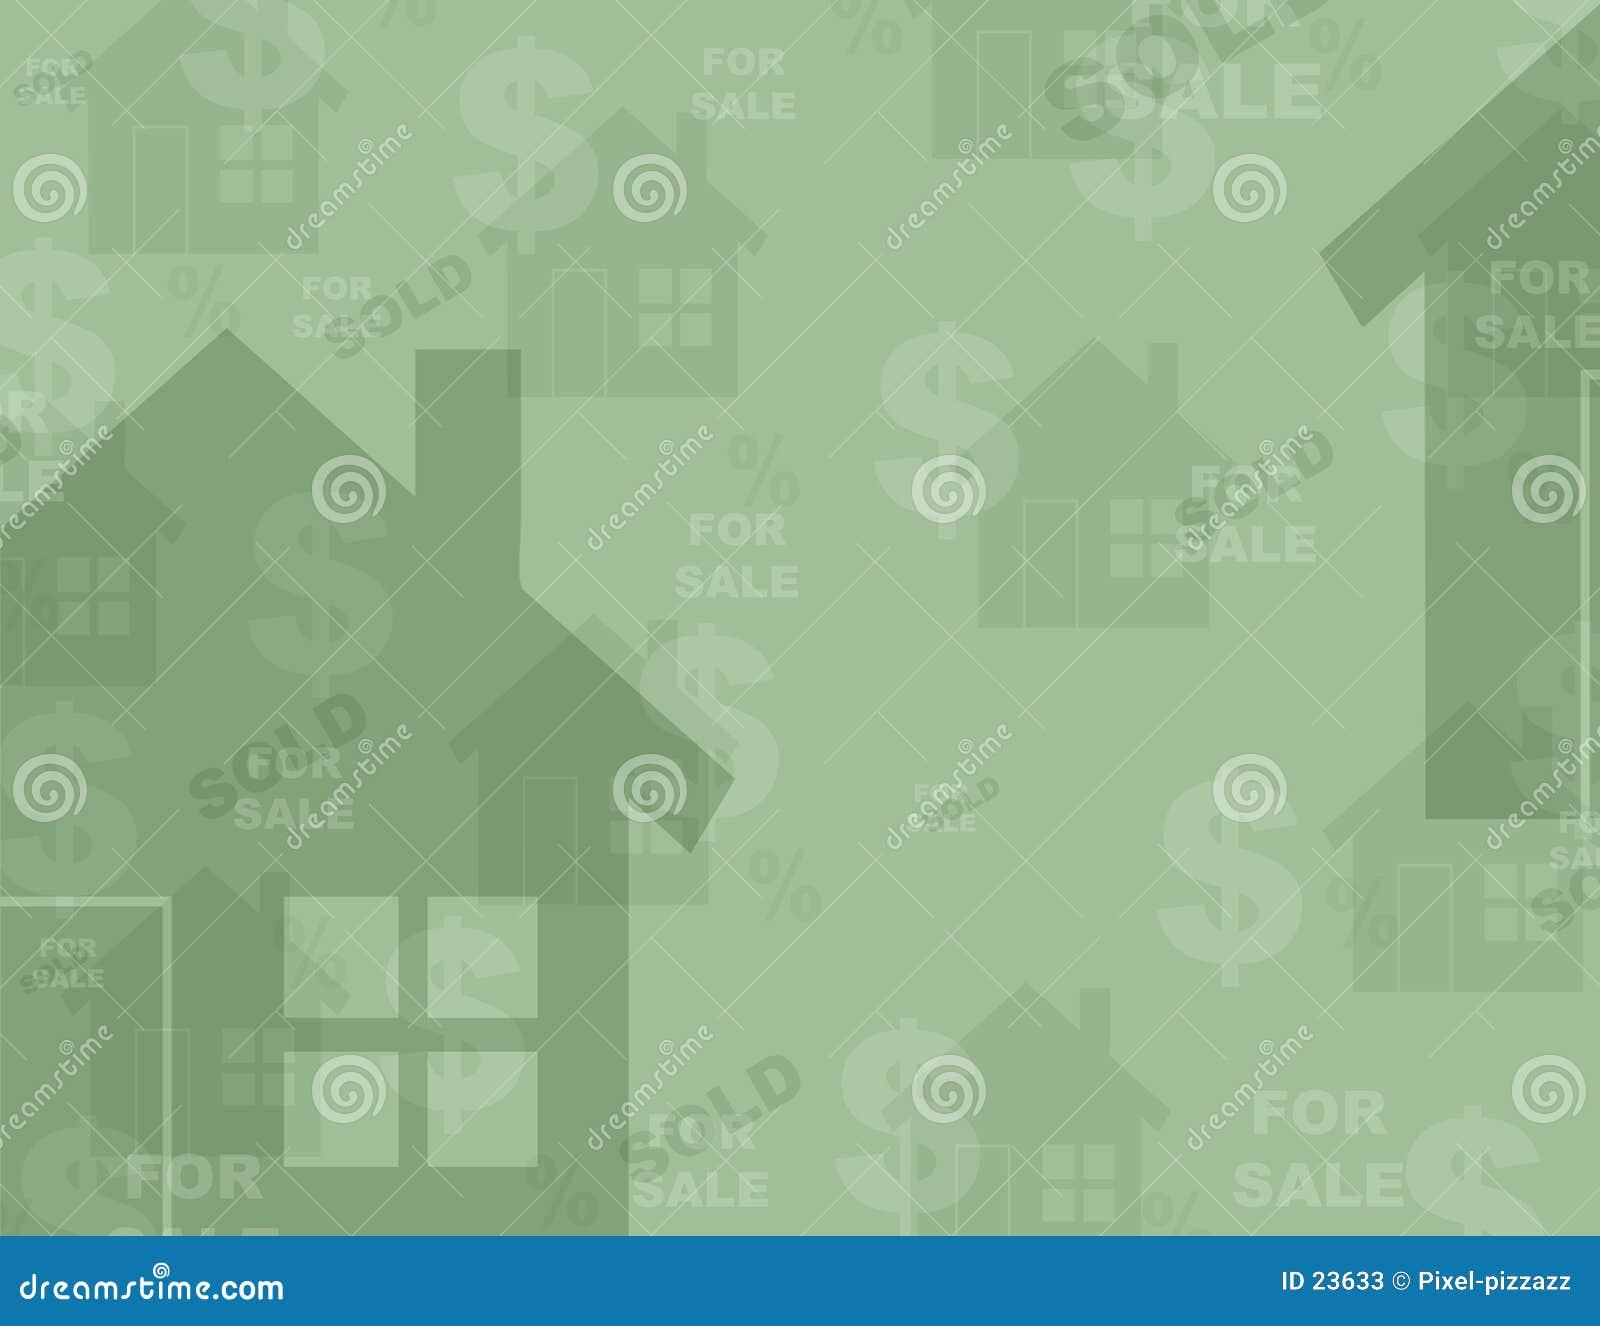 Background estate real